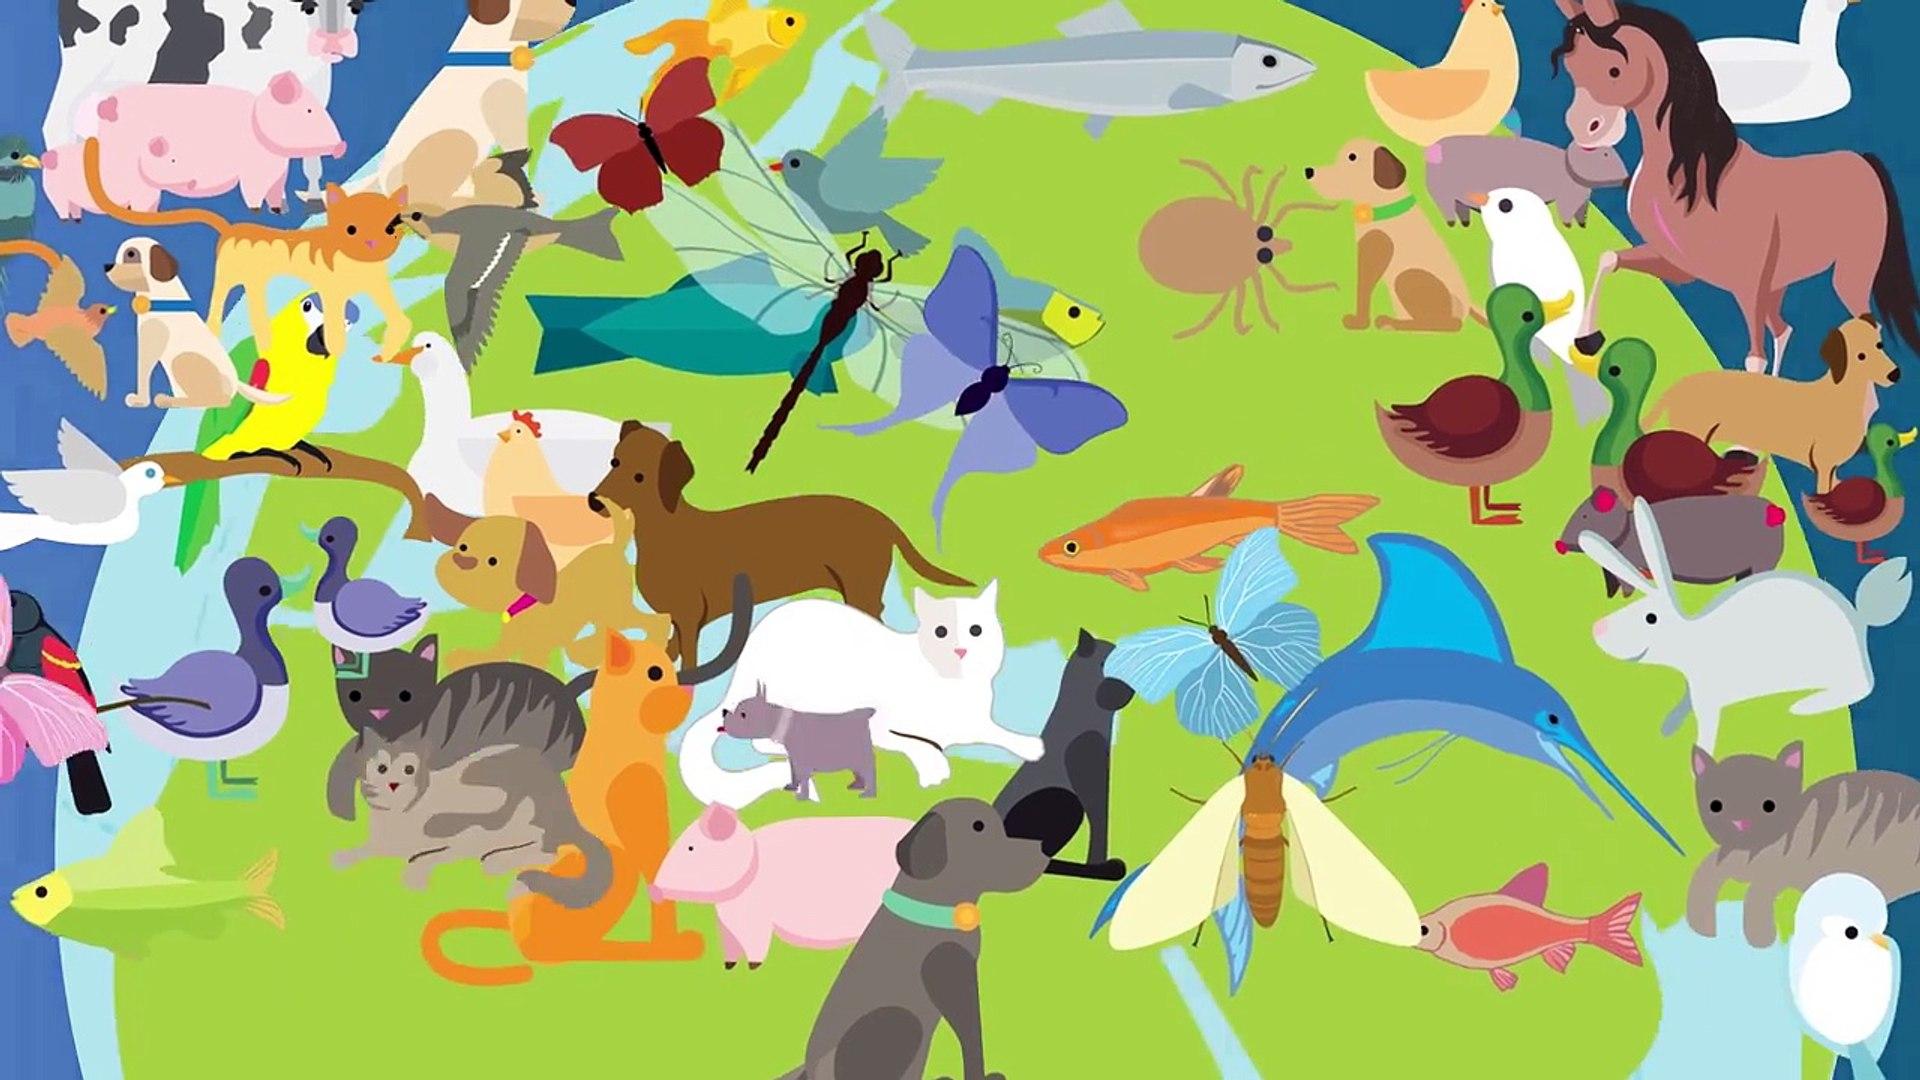 Animation: Companion Animal Vector-Borne Diseases